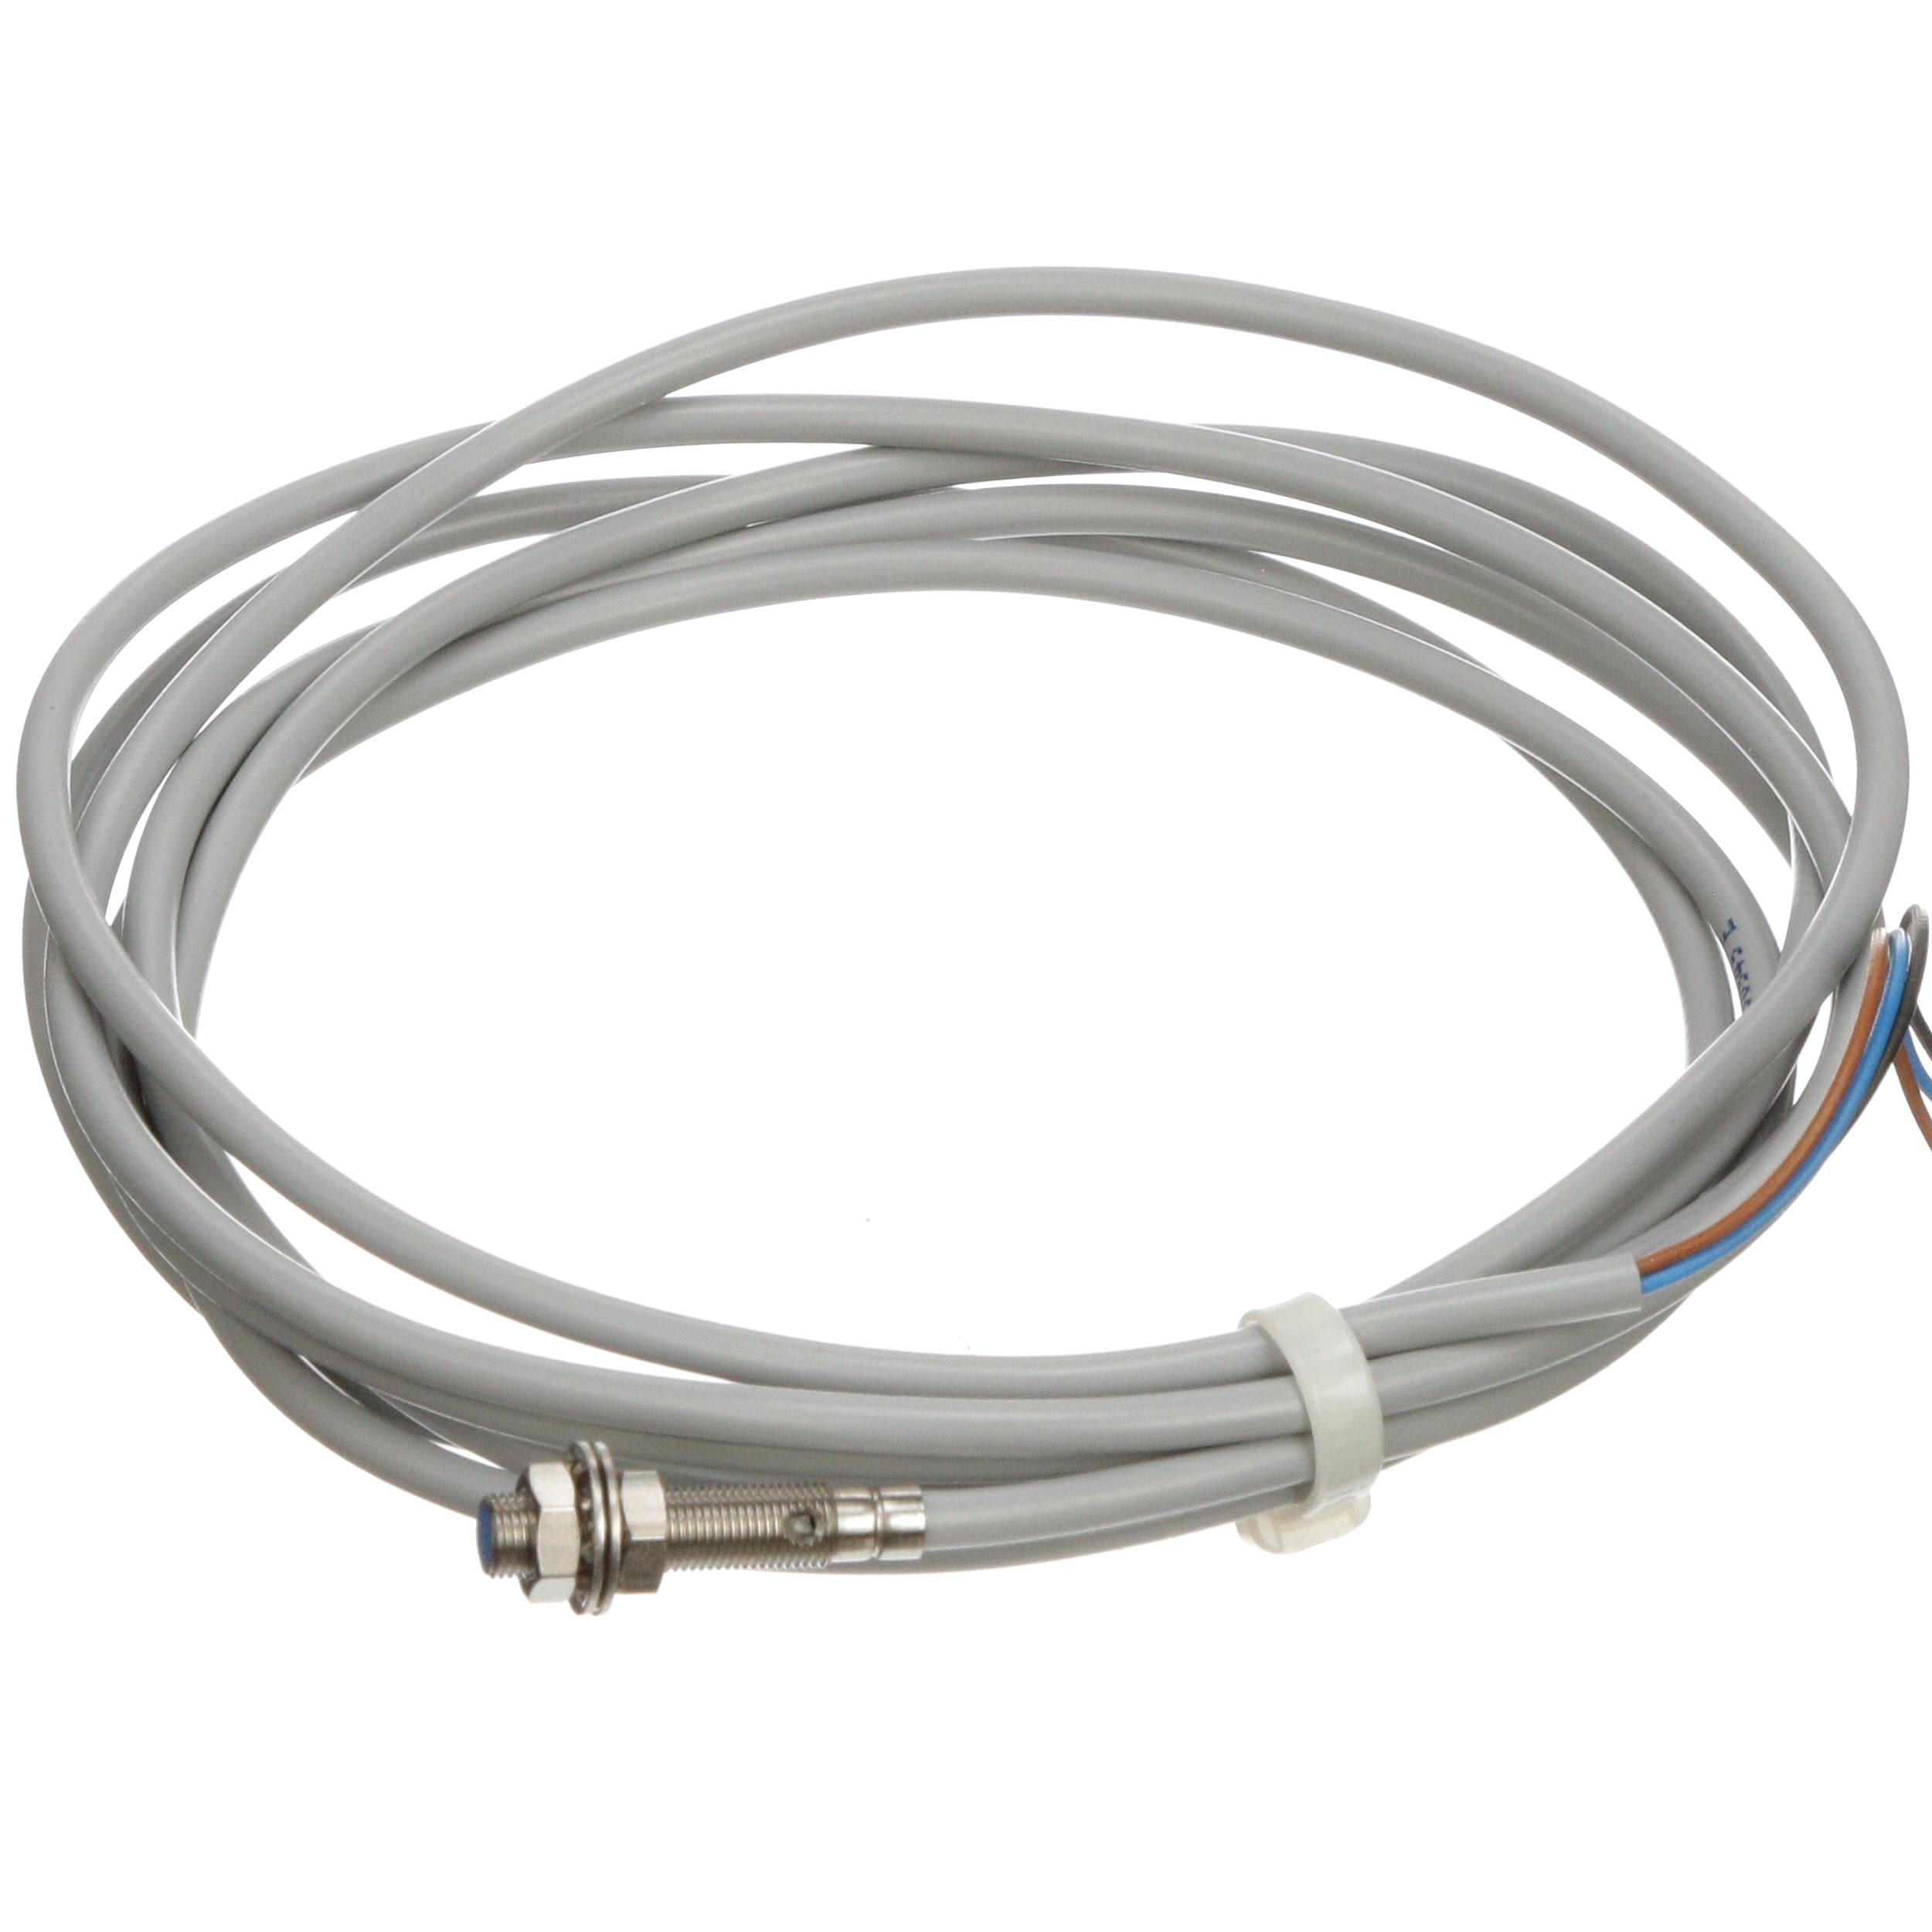 Sick Im05 0b8ps Zw1 Proximity Sensor Inductive Imm 0 8mm Flush Pnp No 2m Cable Imm Series Allied Electronics Automation